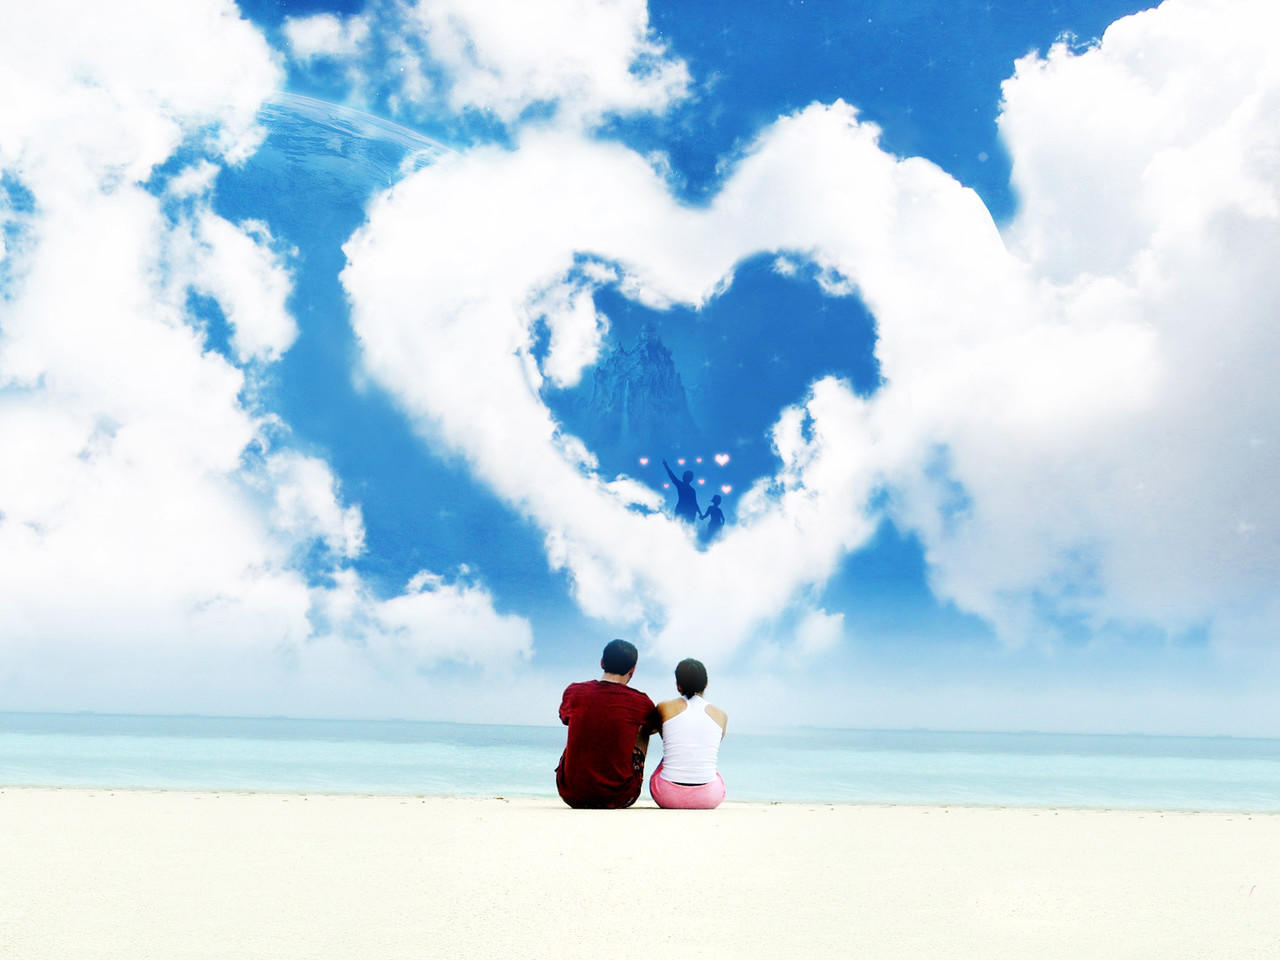 Yang Kamu Rasakan Setelah Genap Setahun Berpacaran